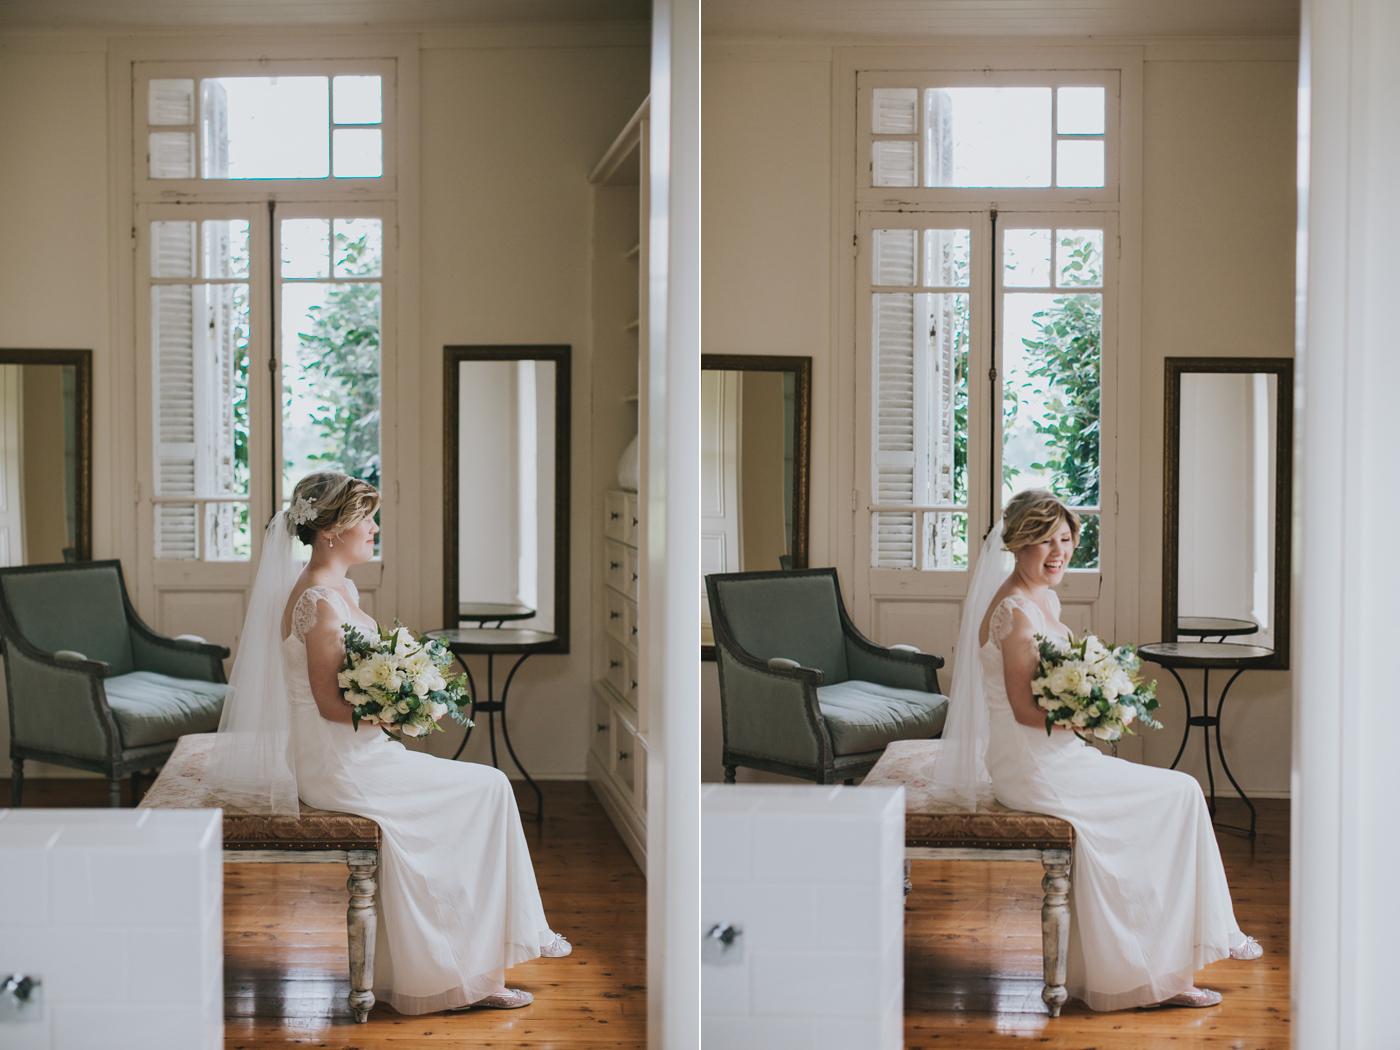 Rachel & Jacob - Willow Farm Berry - South Coast Wedding - Samantha Heather Photography-35.jpg